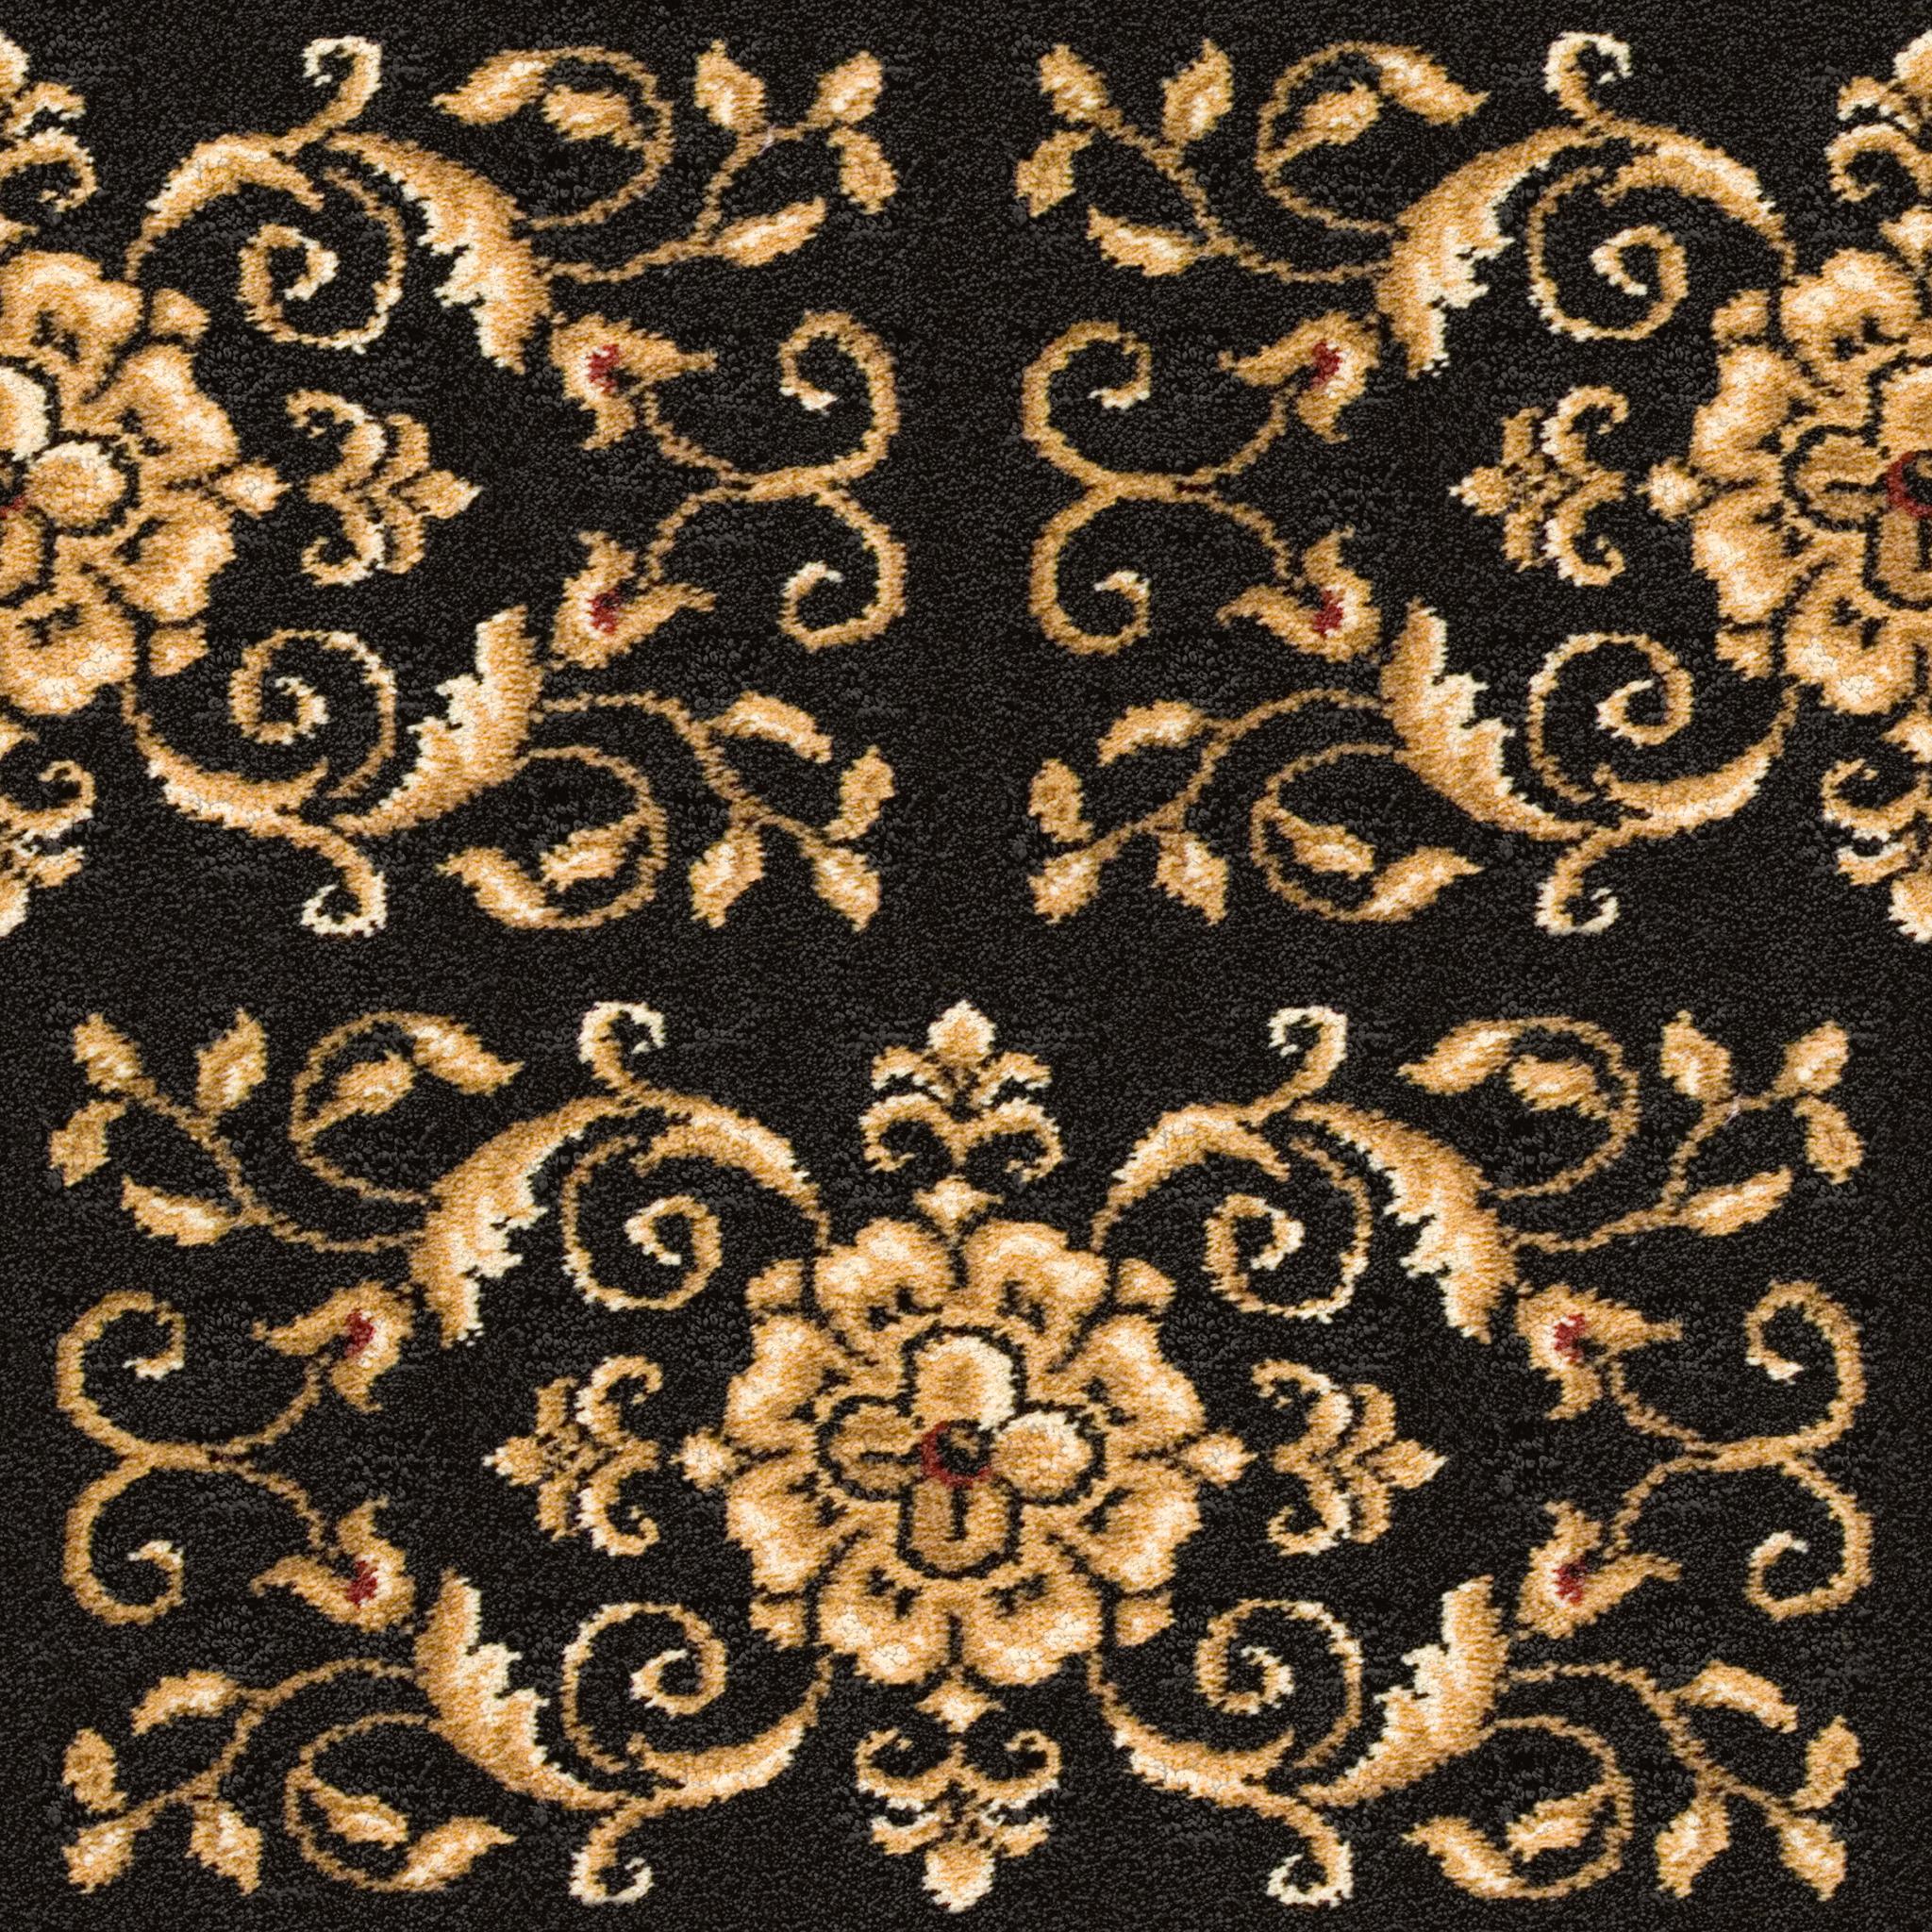 Black Scrolls Carpet.jpg